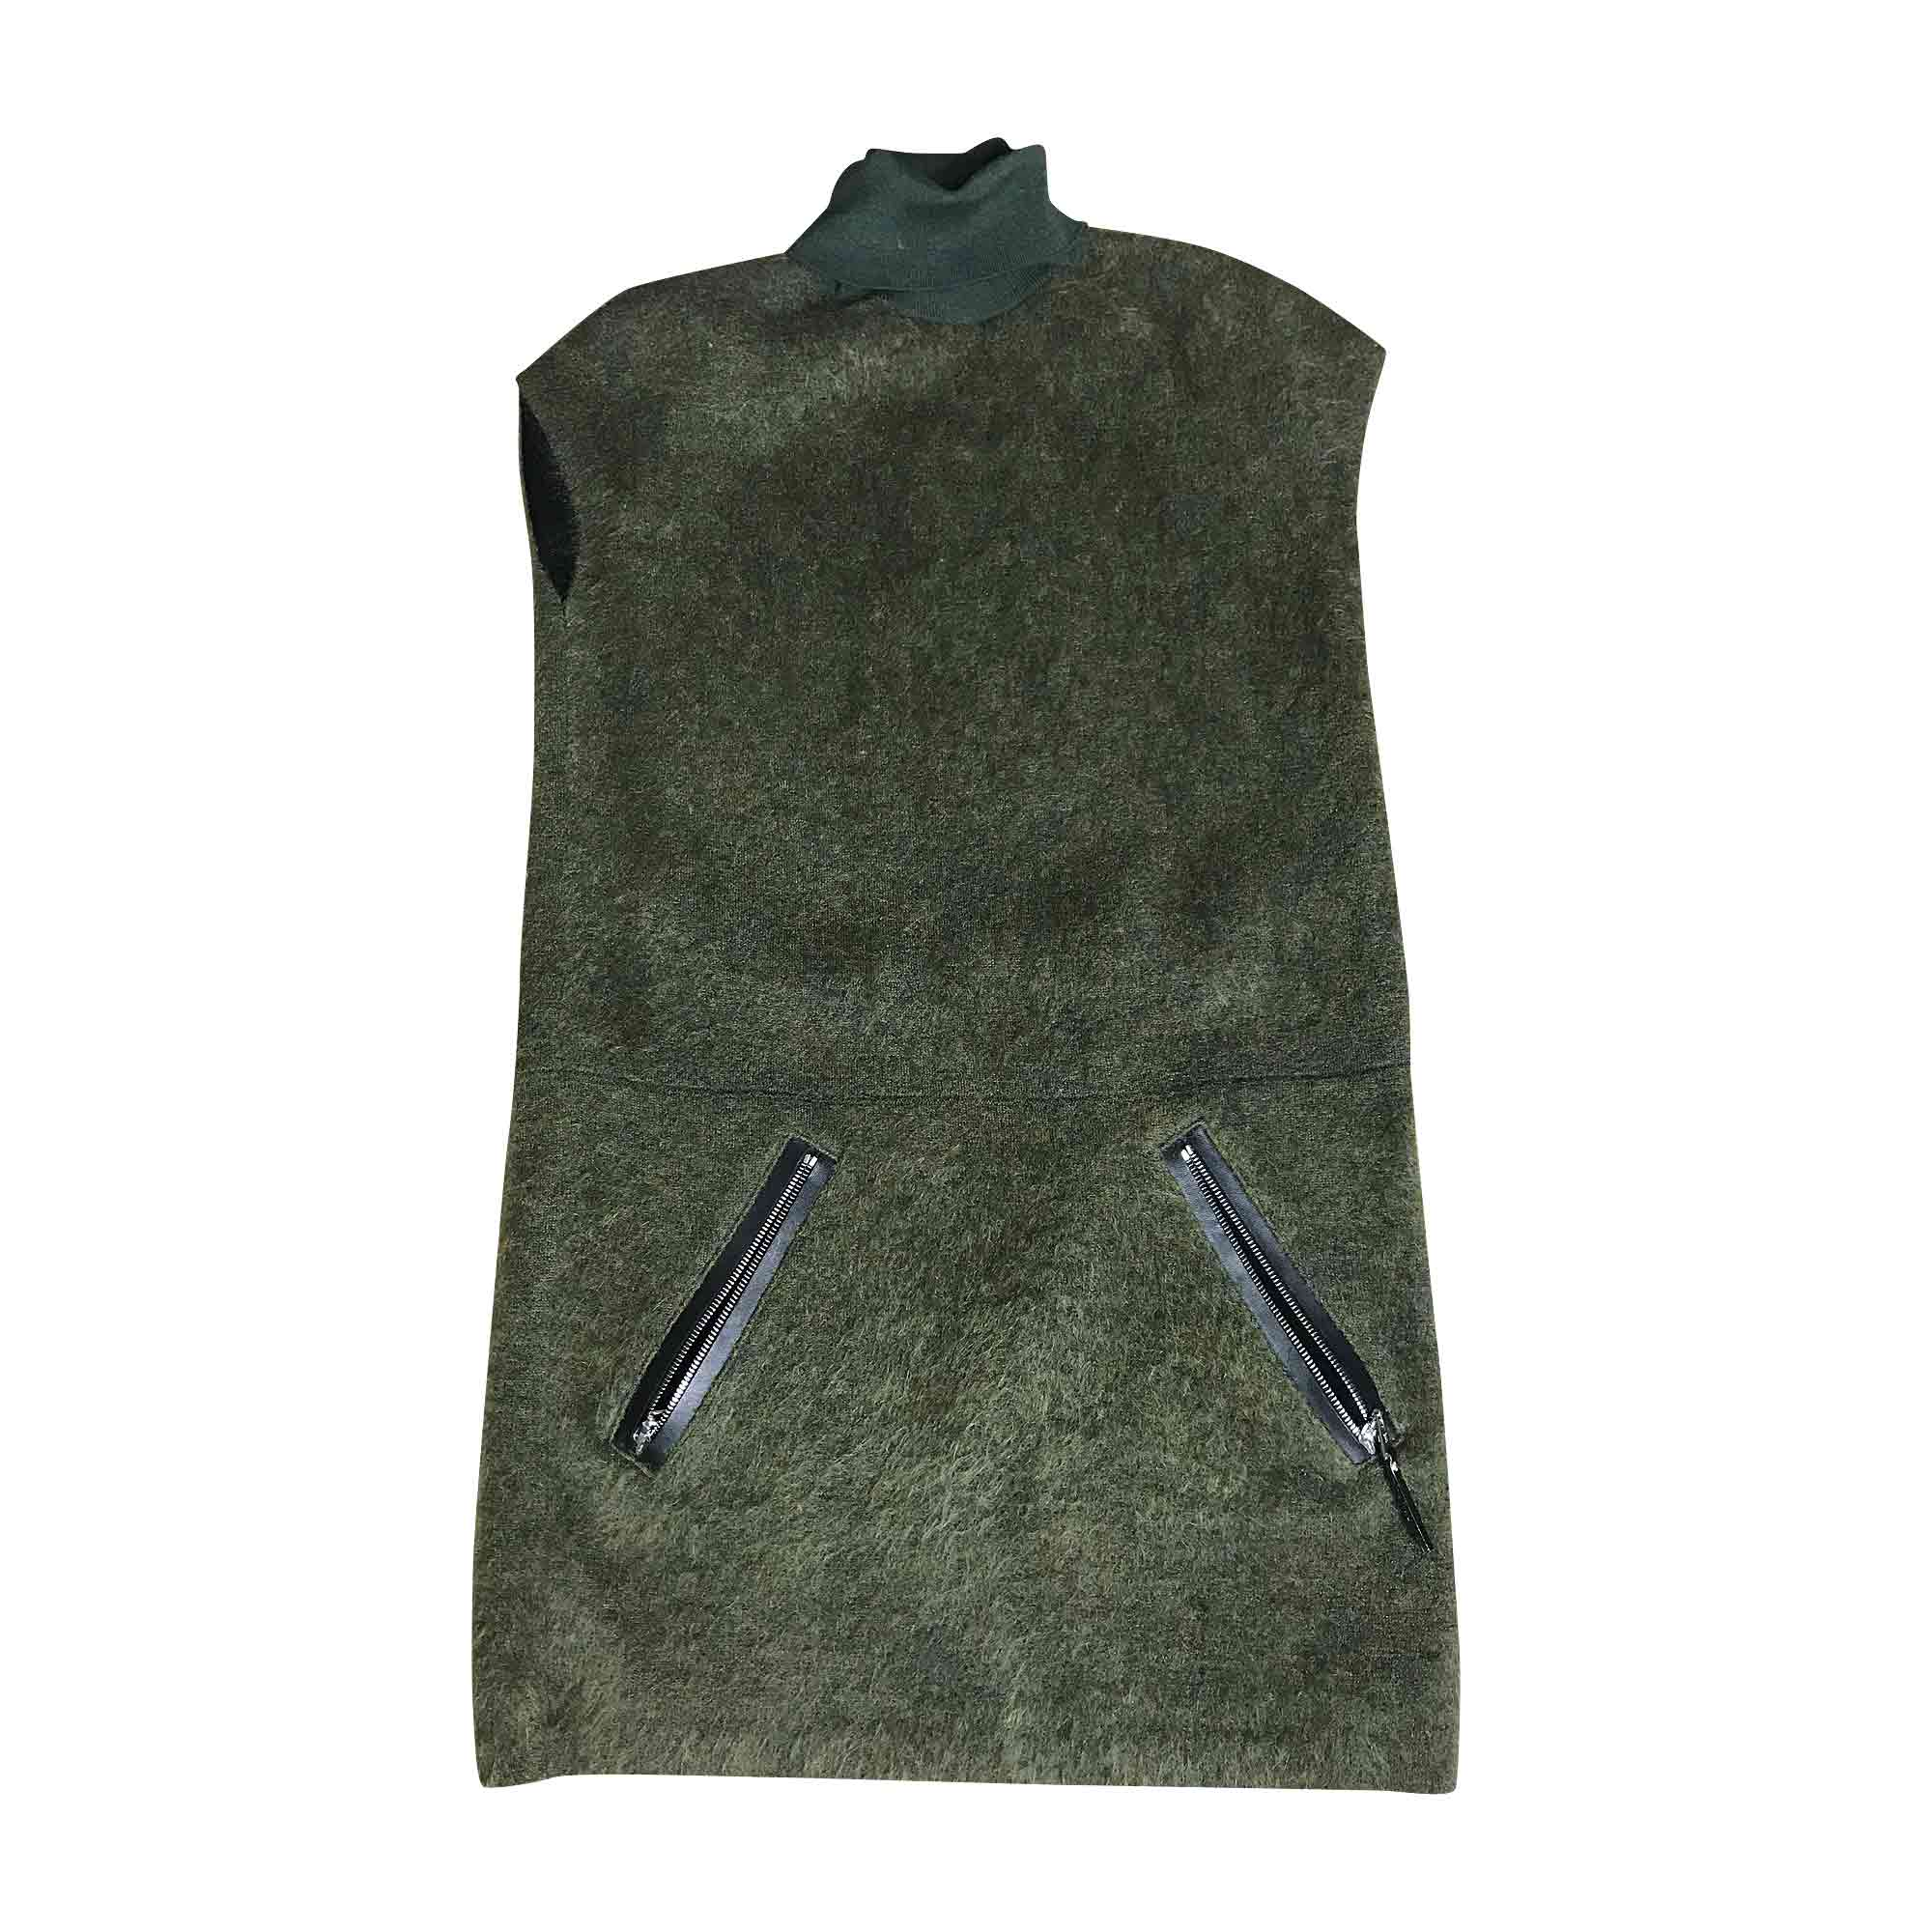 5f2cb2a4bbd9f Midi-Kleid LOUIS VUITTON 38 (M